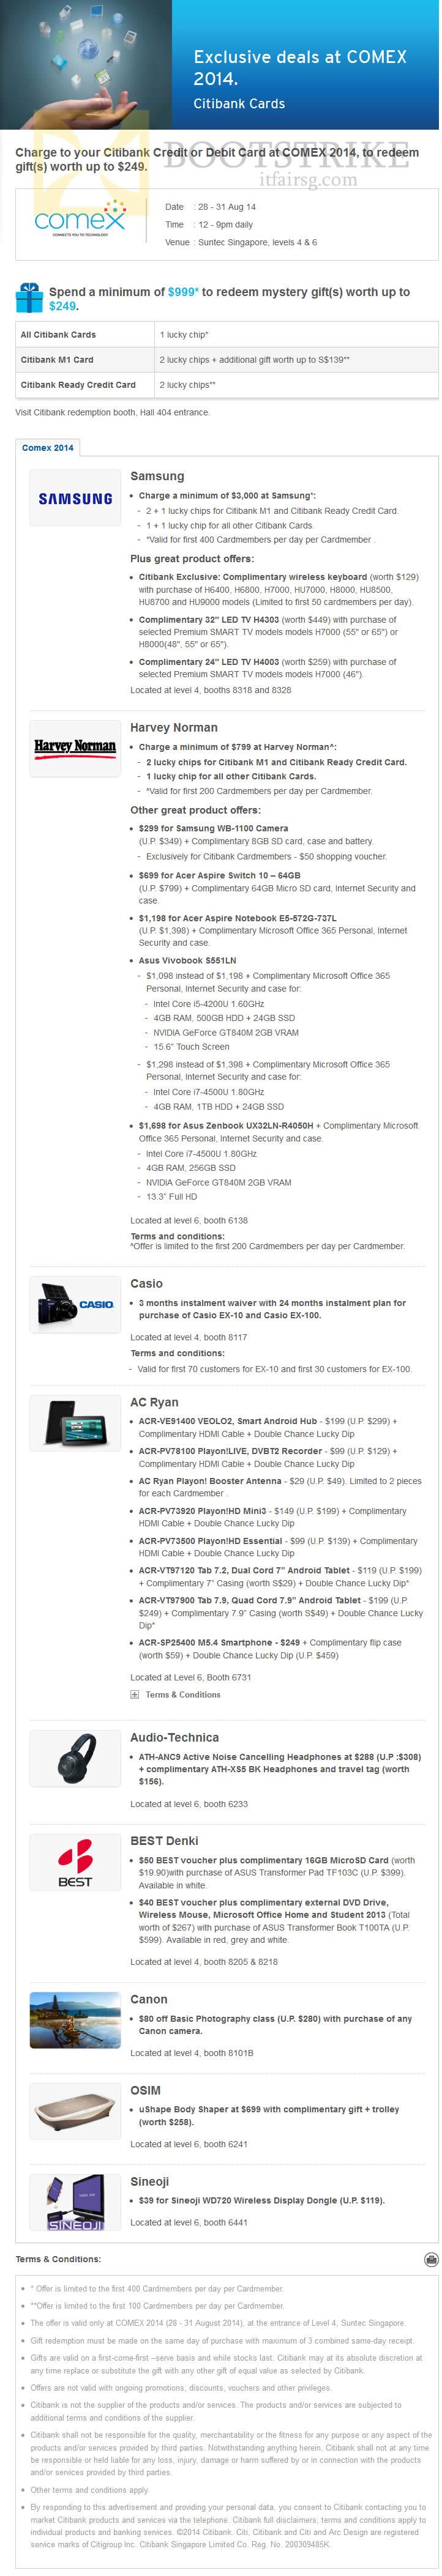 COMEX 2014 price list image brochure of Citibank Spend N Redeem, Retailer Offers Harvey Norman, Casio, AC Ryan, Canon, Sineoji, Osim